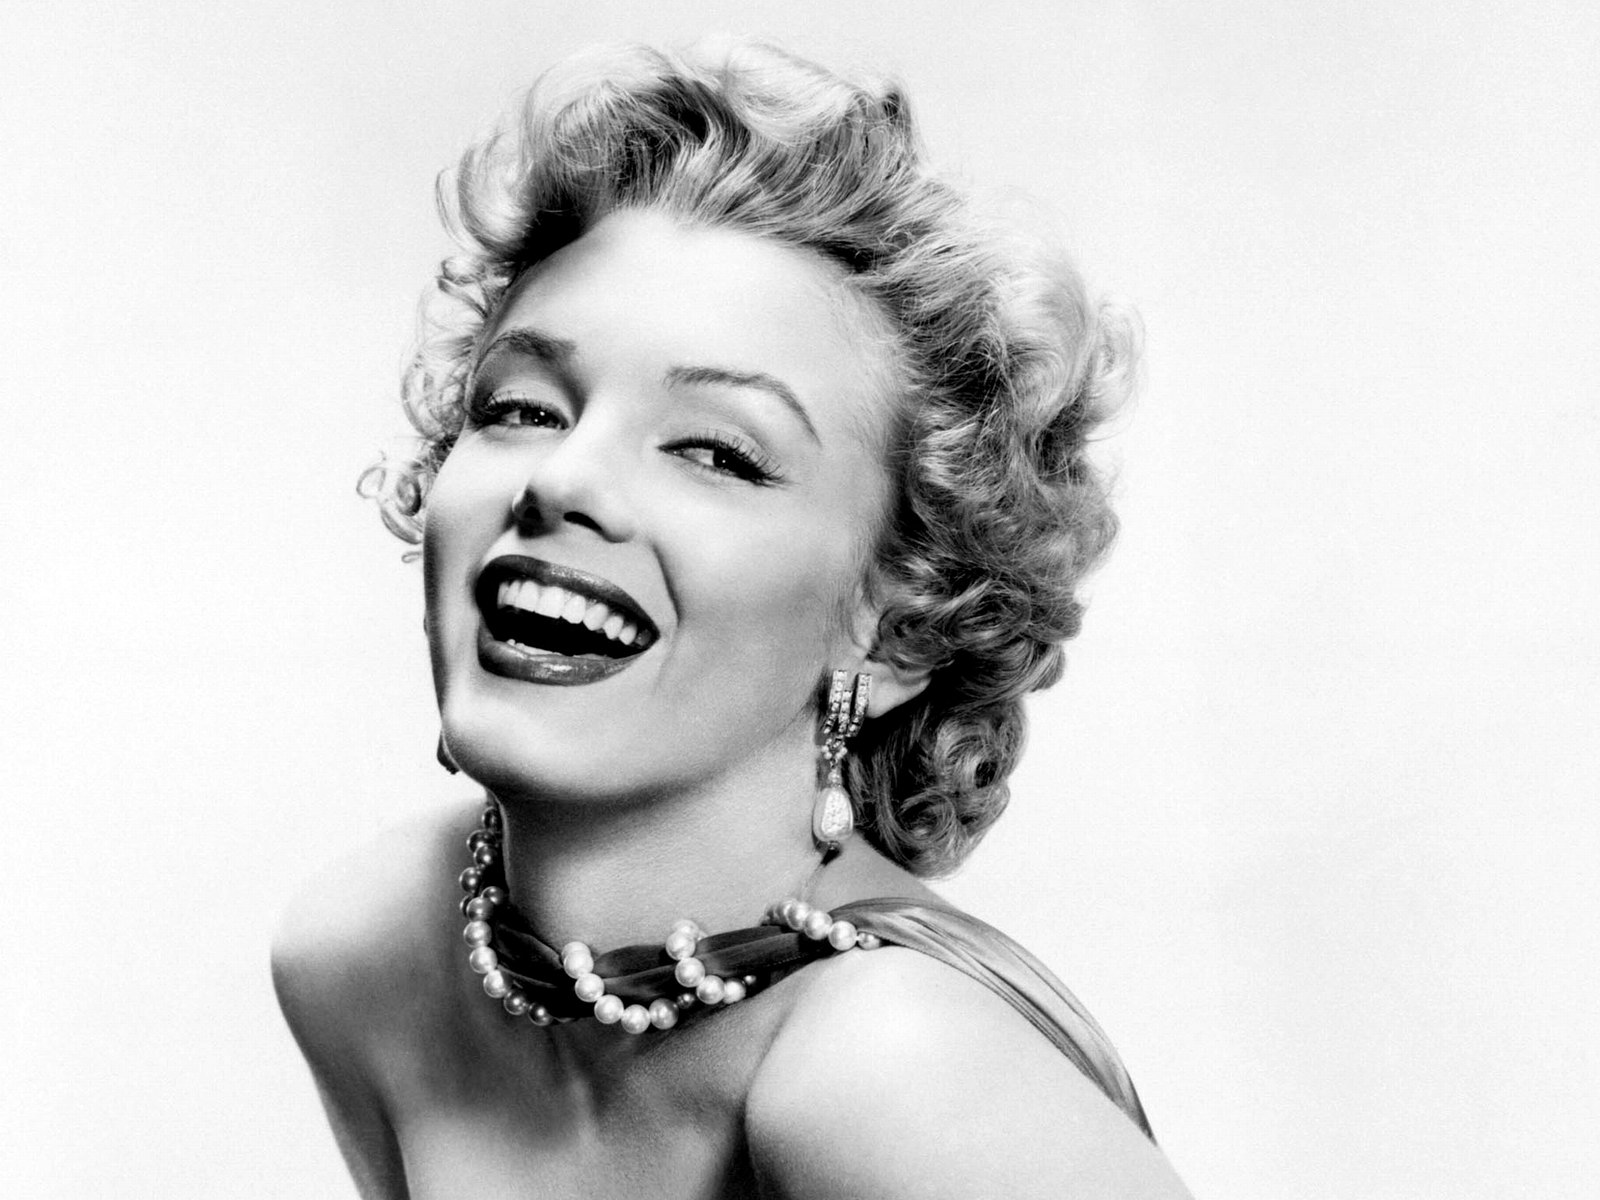 Marilyn Monroe ciplak (93 foto) Fappening, 2020, mayo